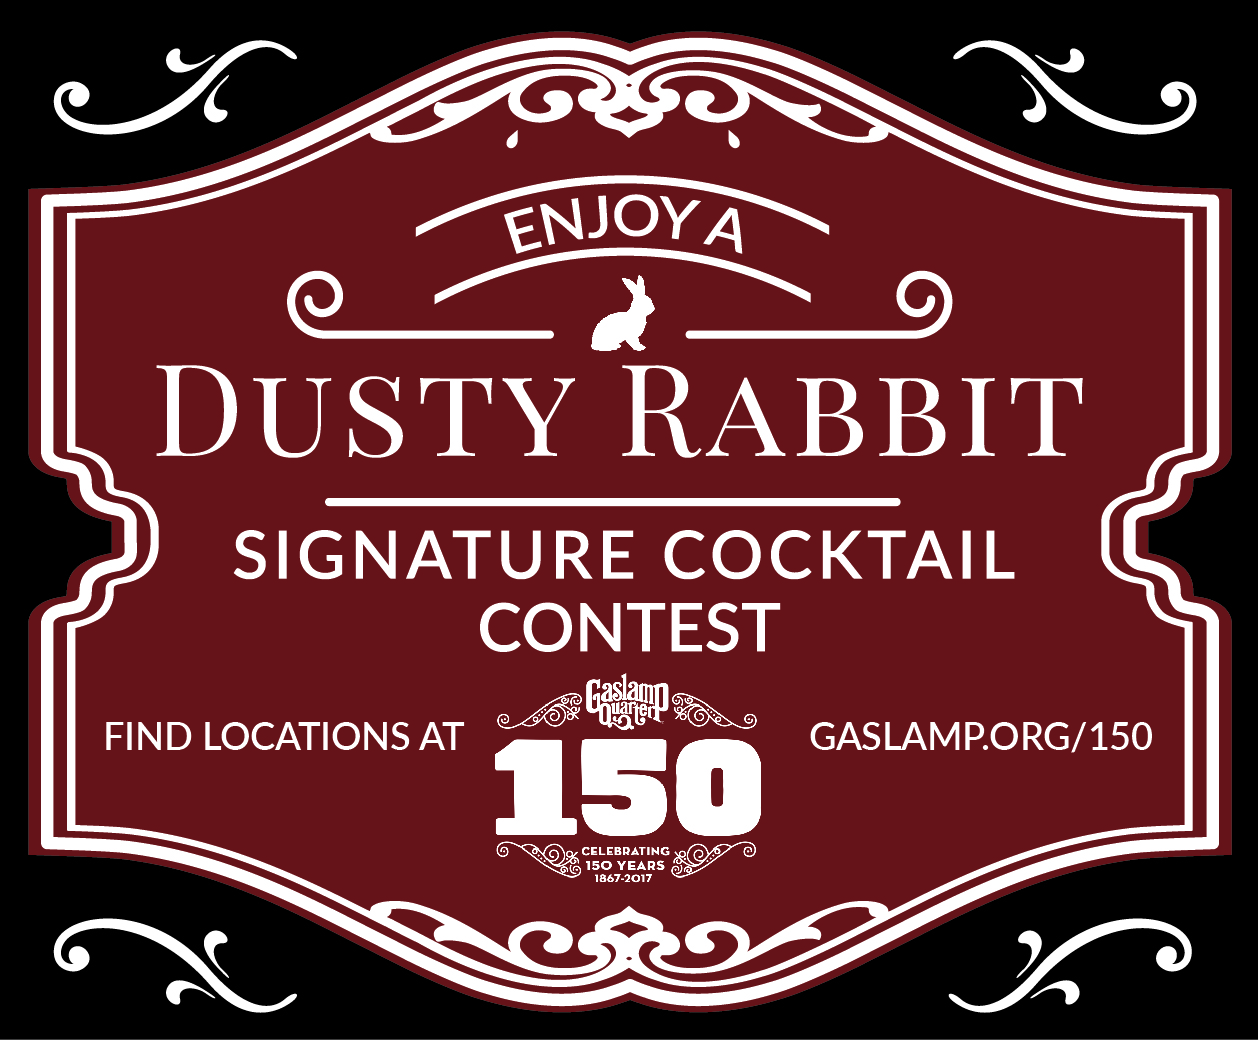 Dusty-Rabbit-Ad-300x250 gaslamp san diego